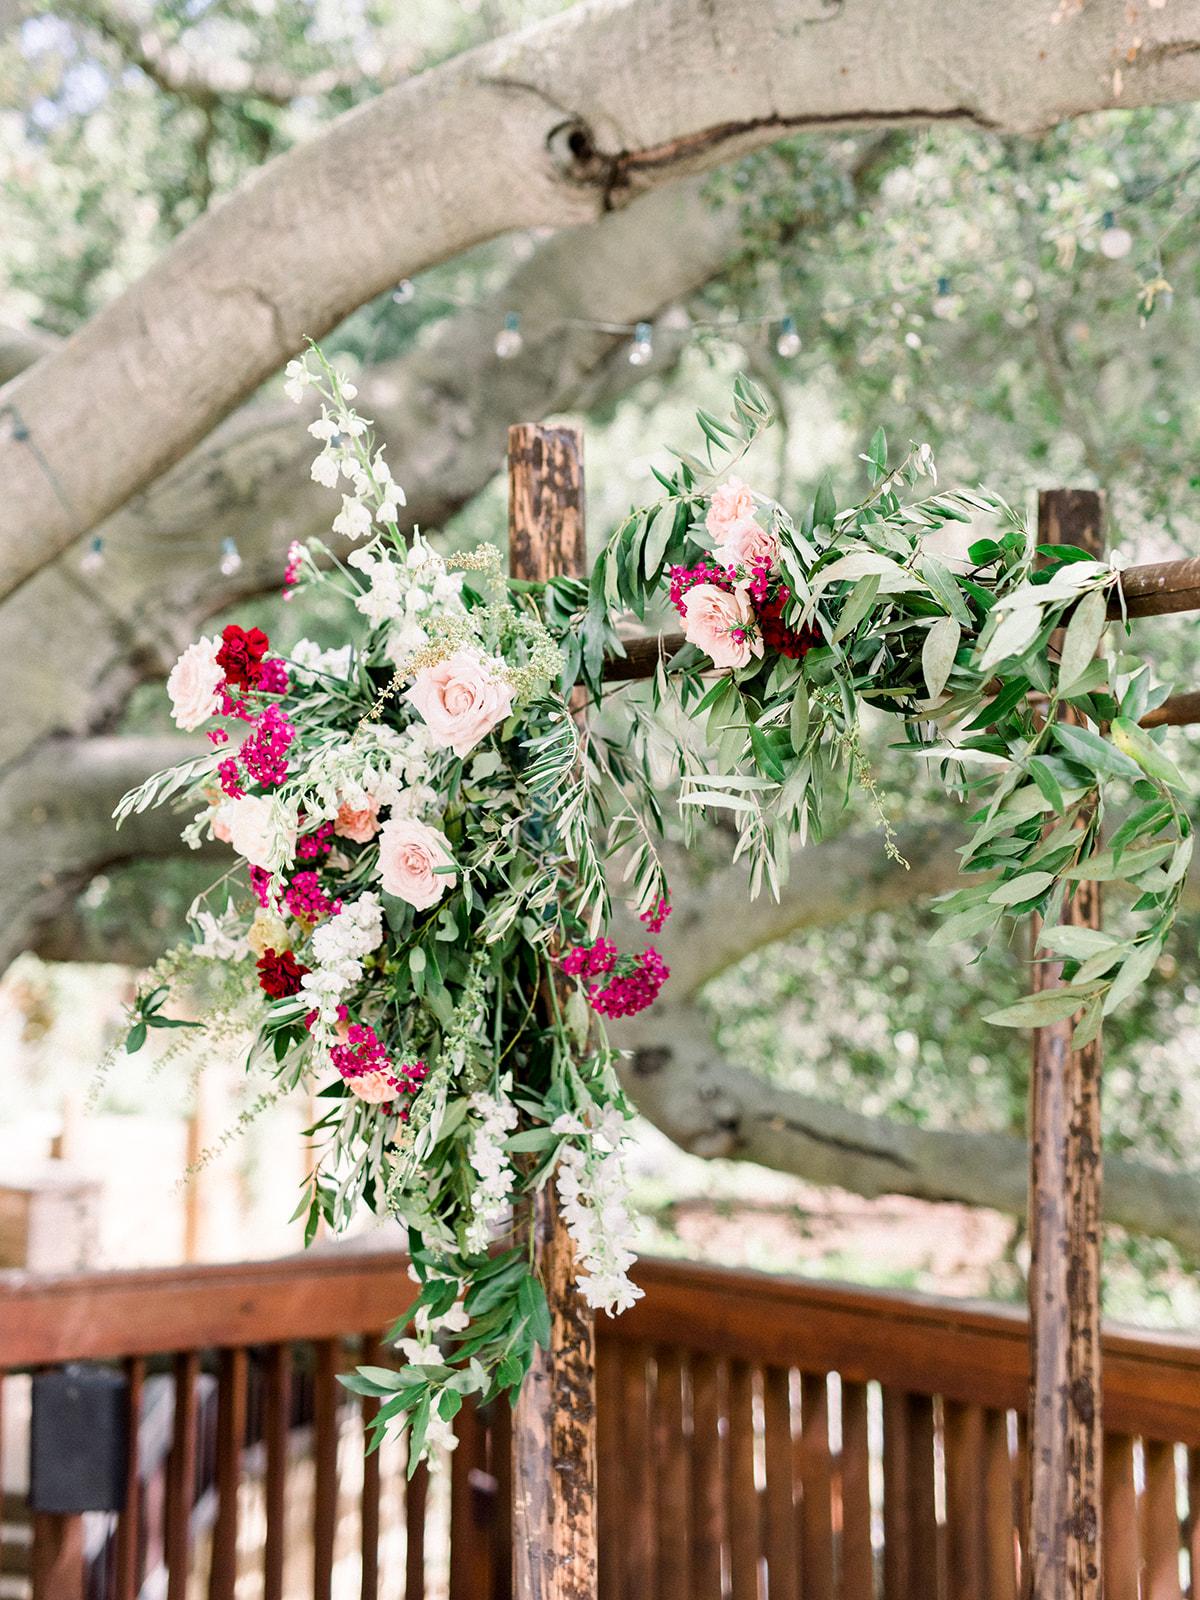 jueunandjon-etherandsmith-wedding-529.jpg